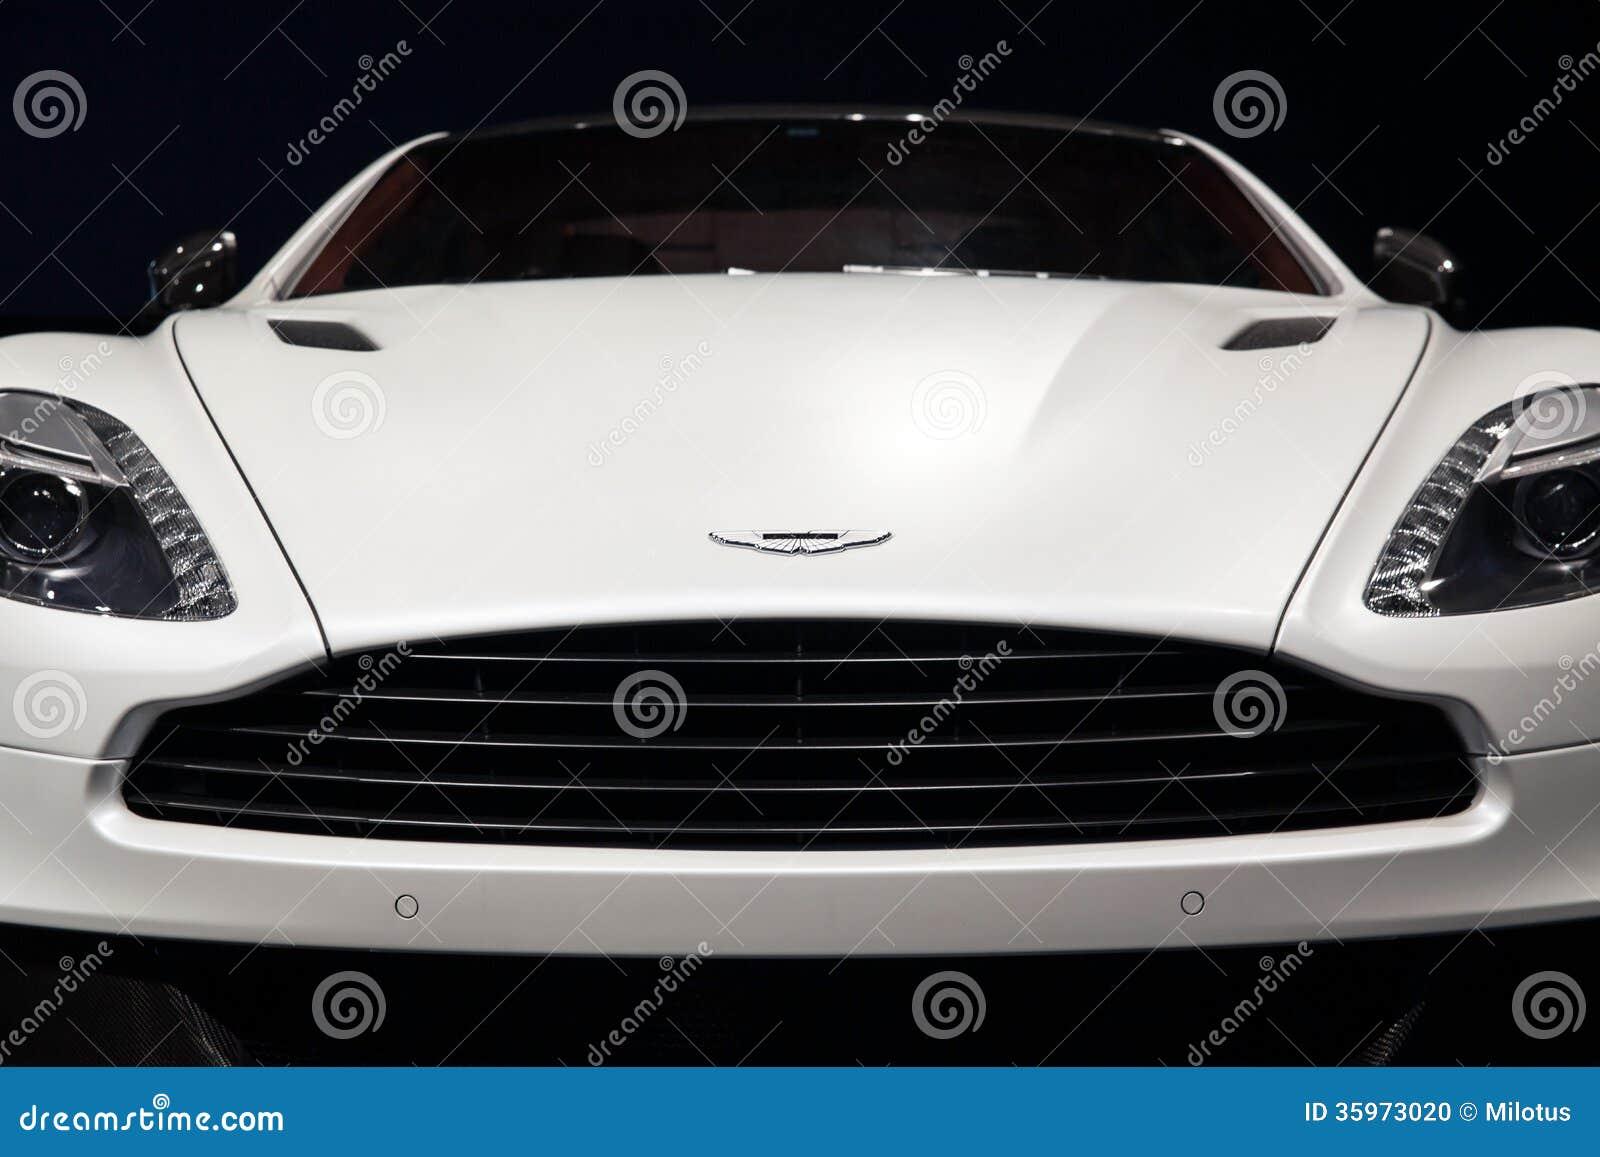 Aston Martin Vanquish-Series